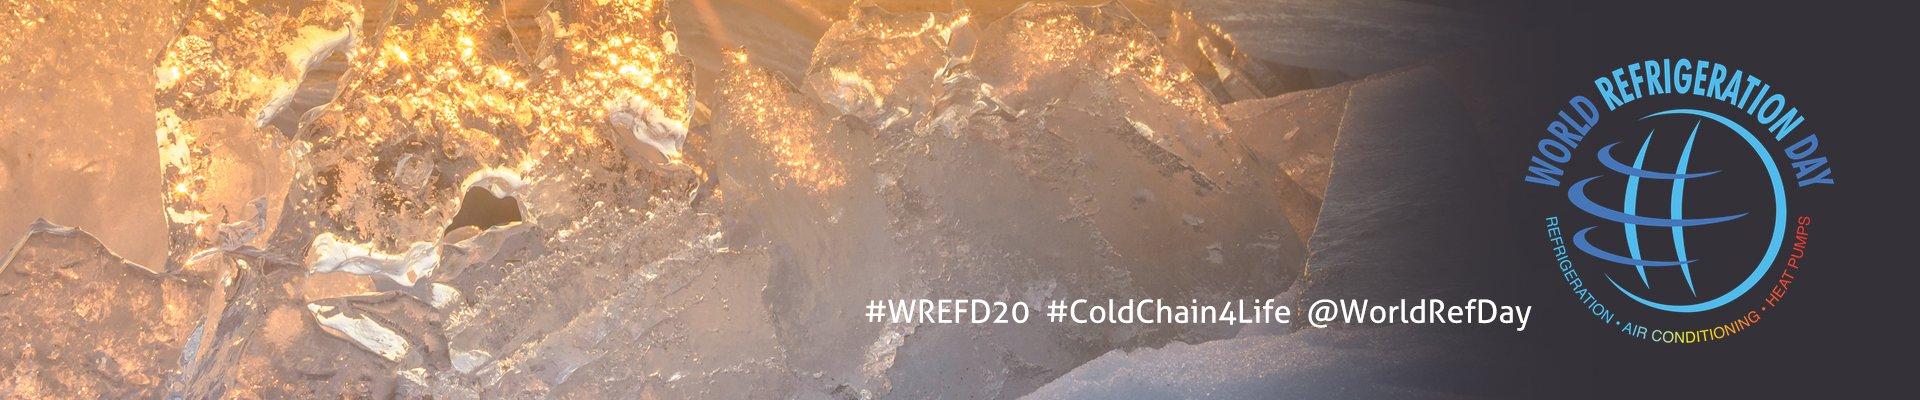 World Refrigeration Day 2020